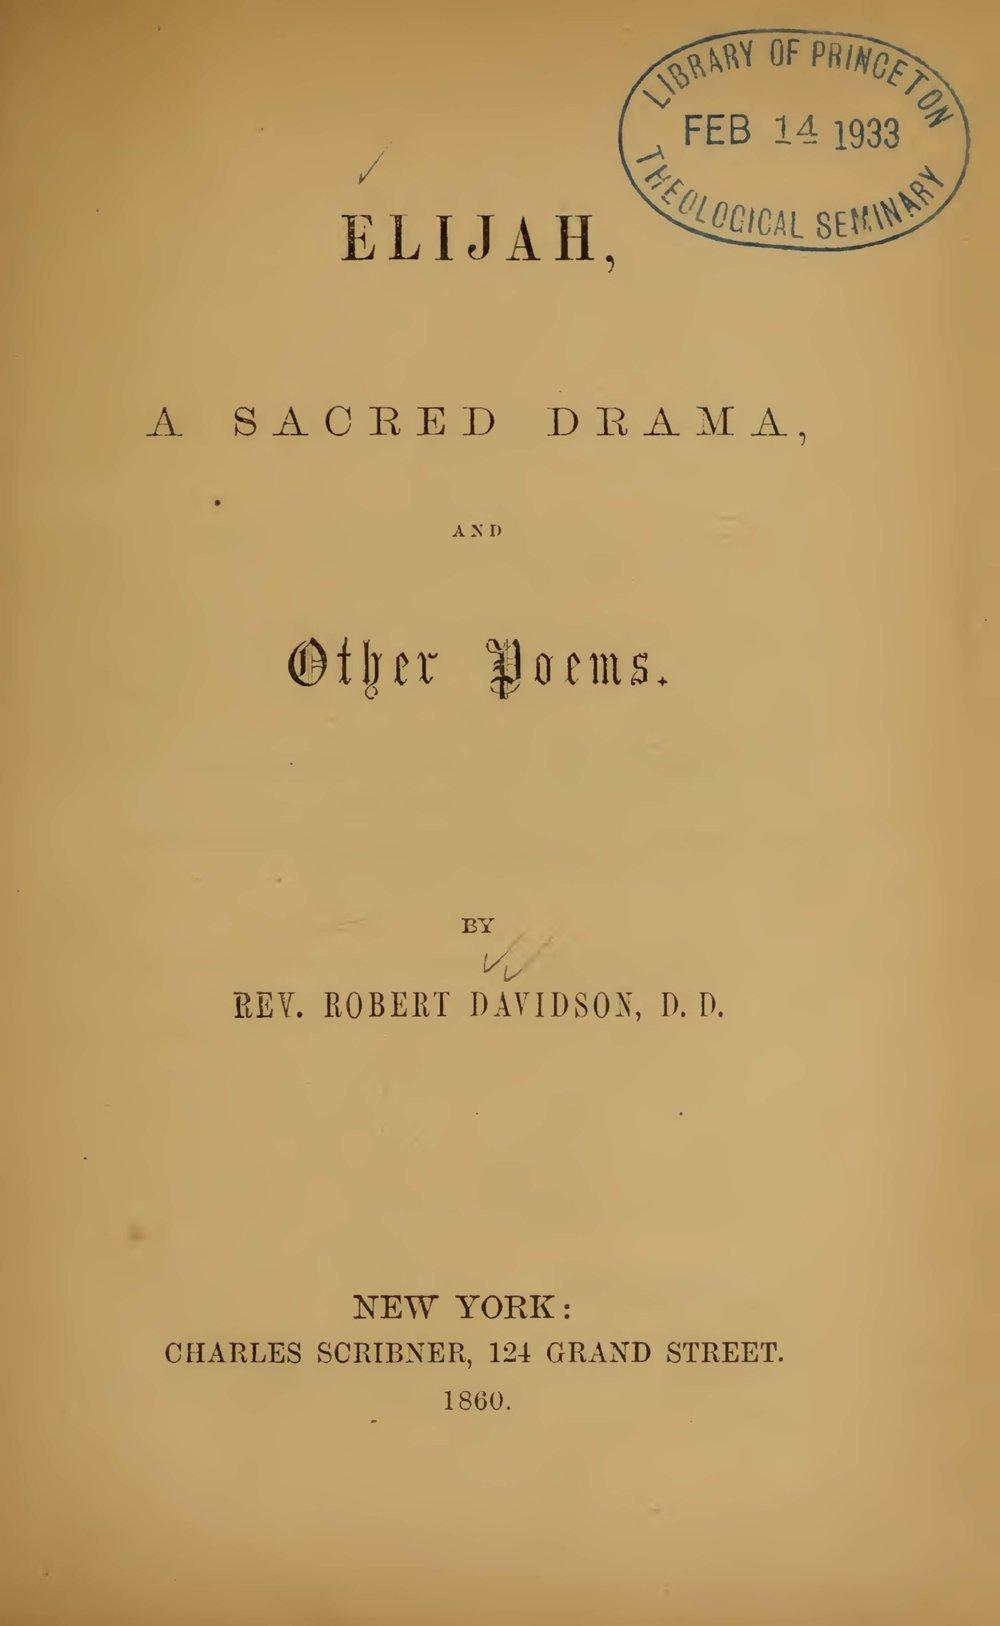 Davidson, Robert, Elijah A Sacred Drama and Other Poems Title Page.jpg